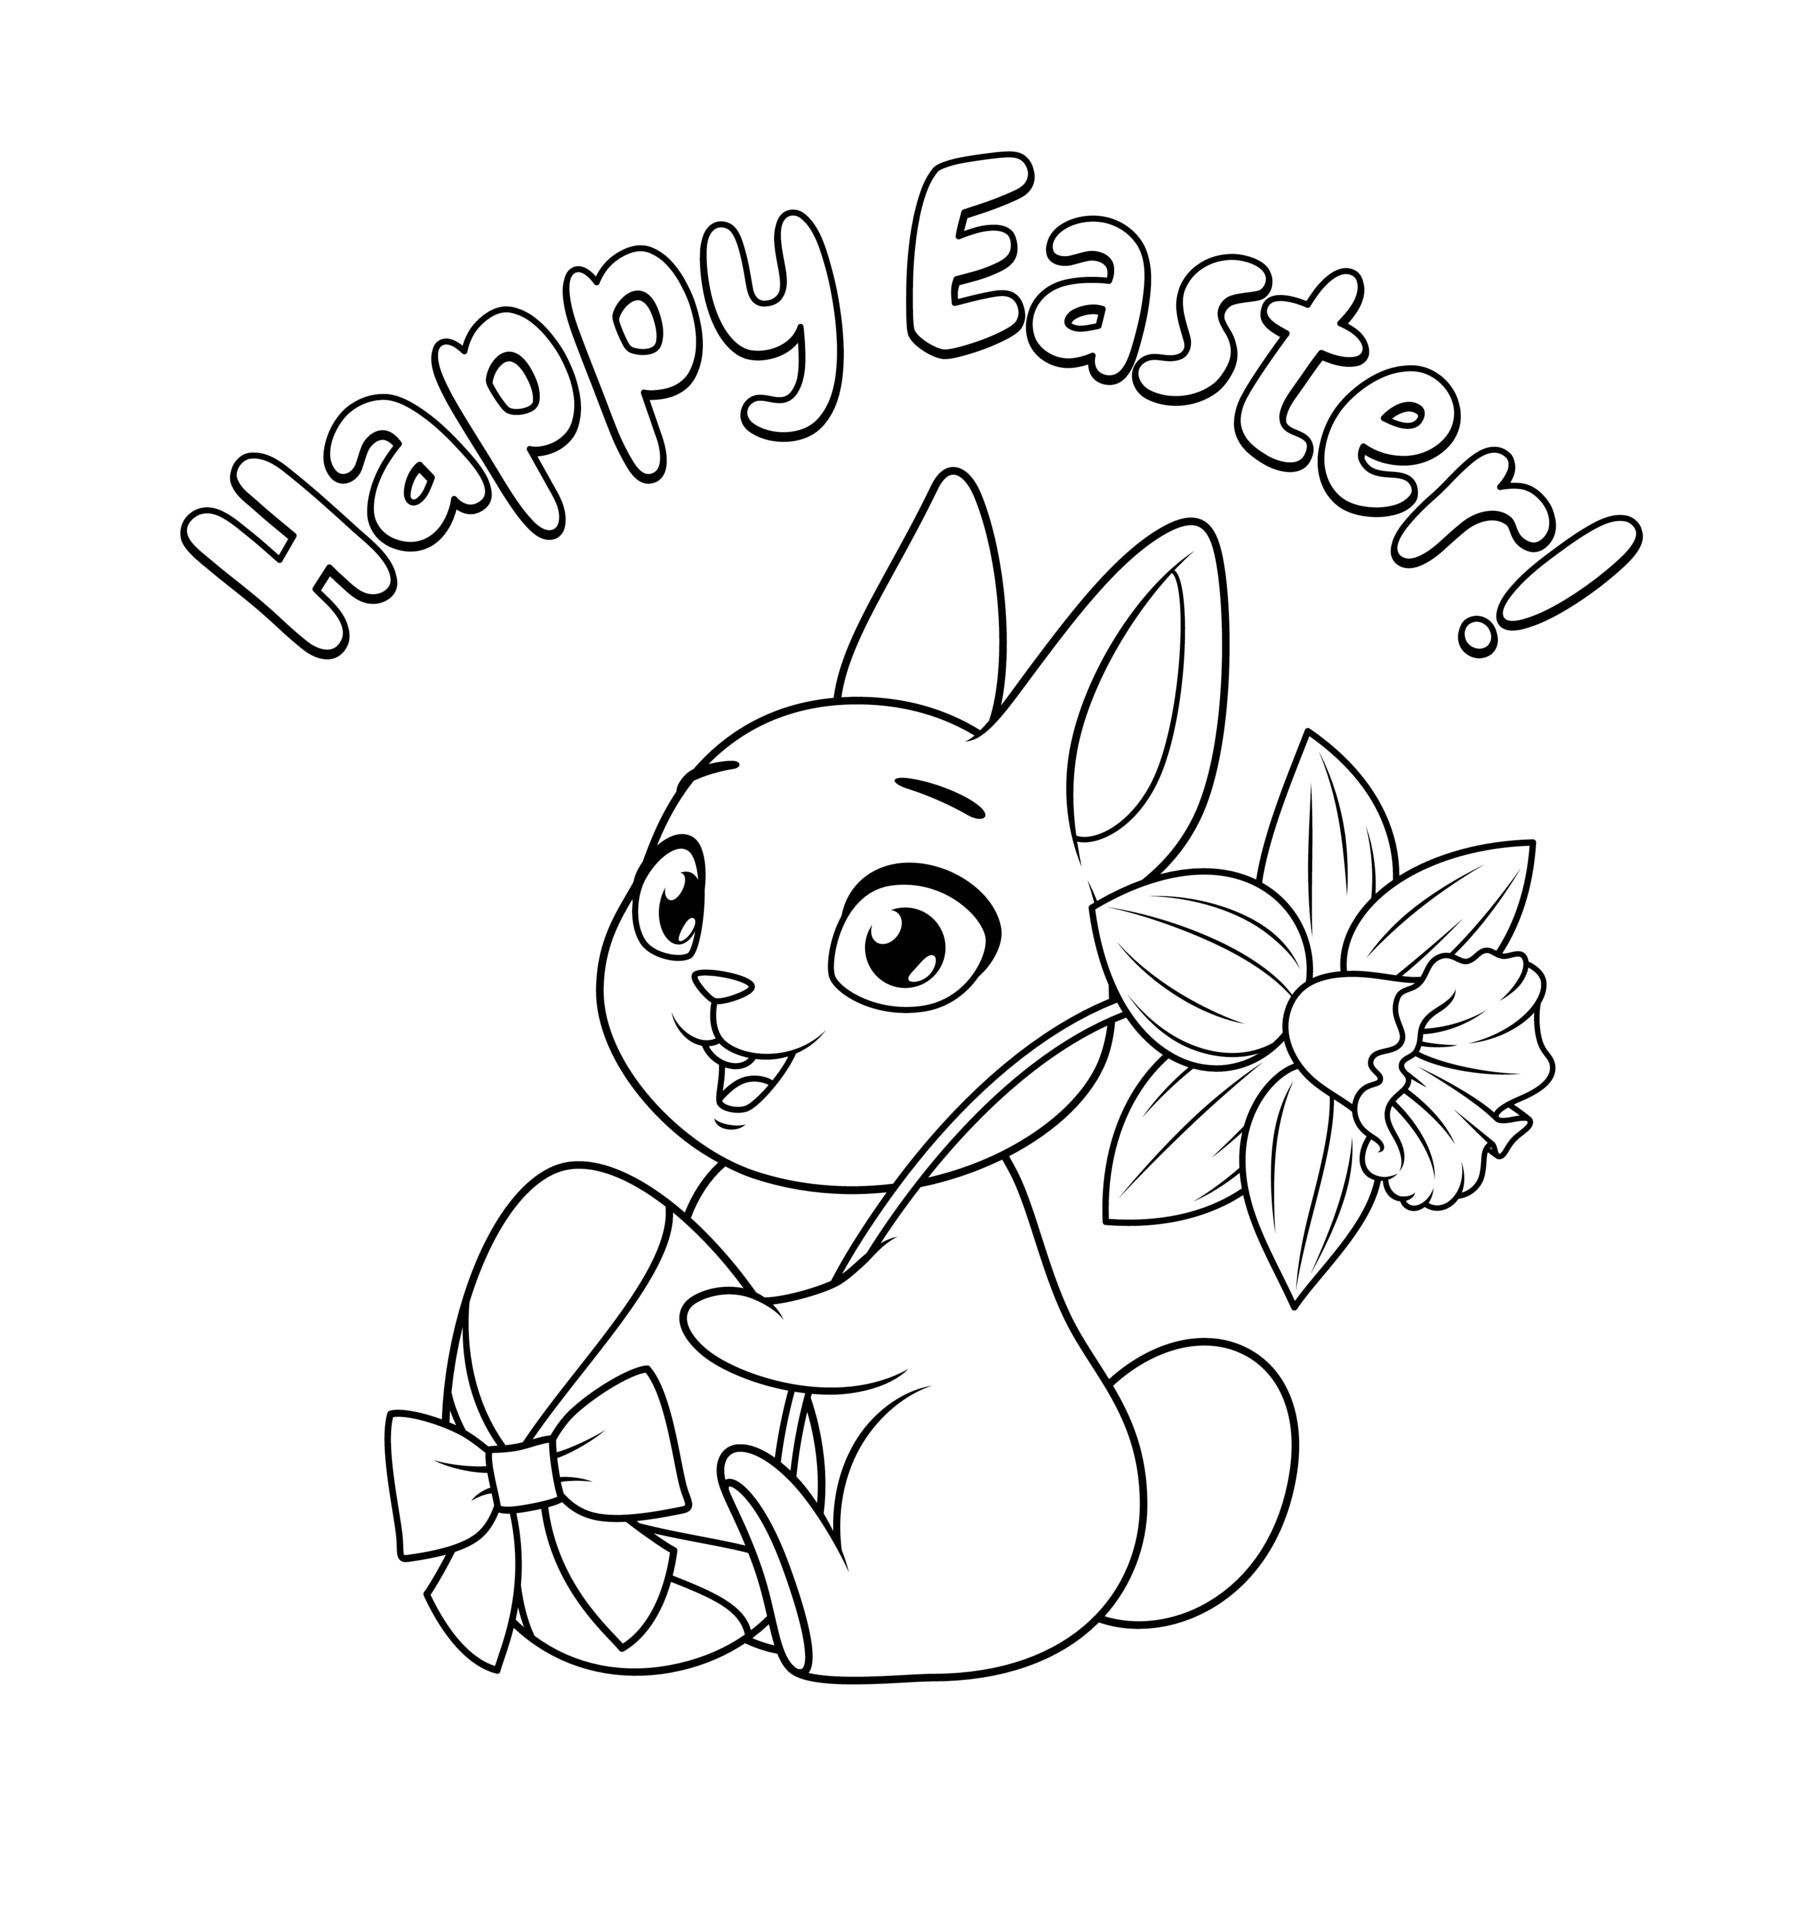 mignon petit lapin tenant oeuf et fleur